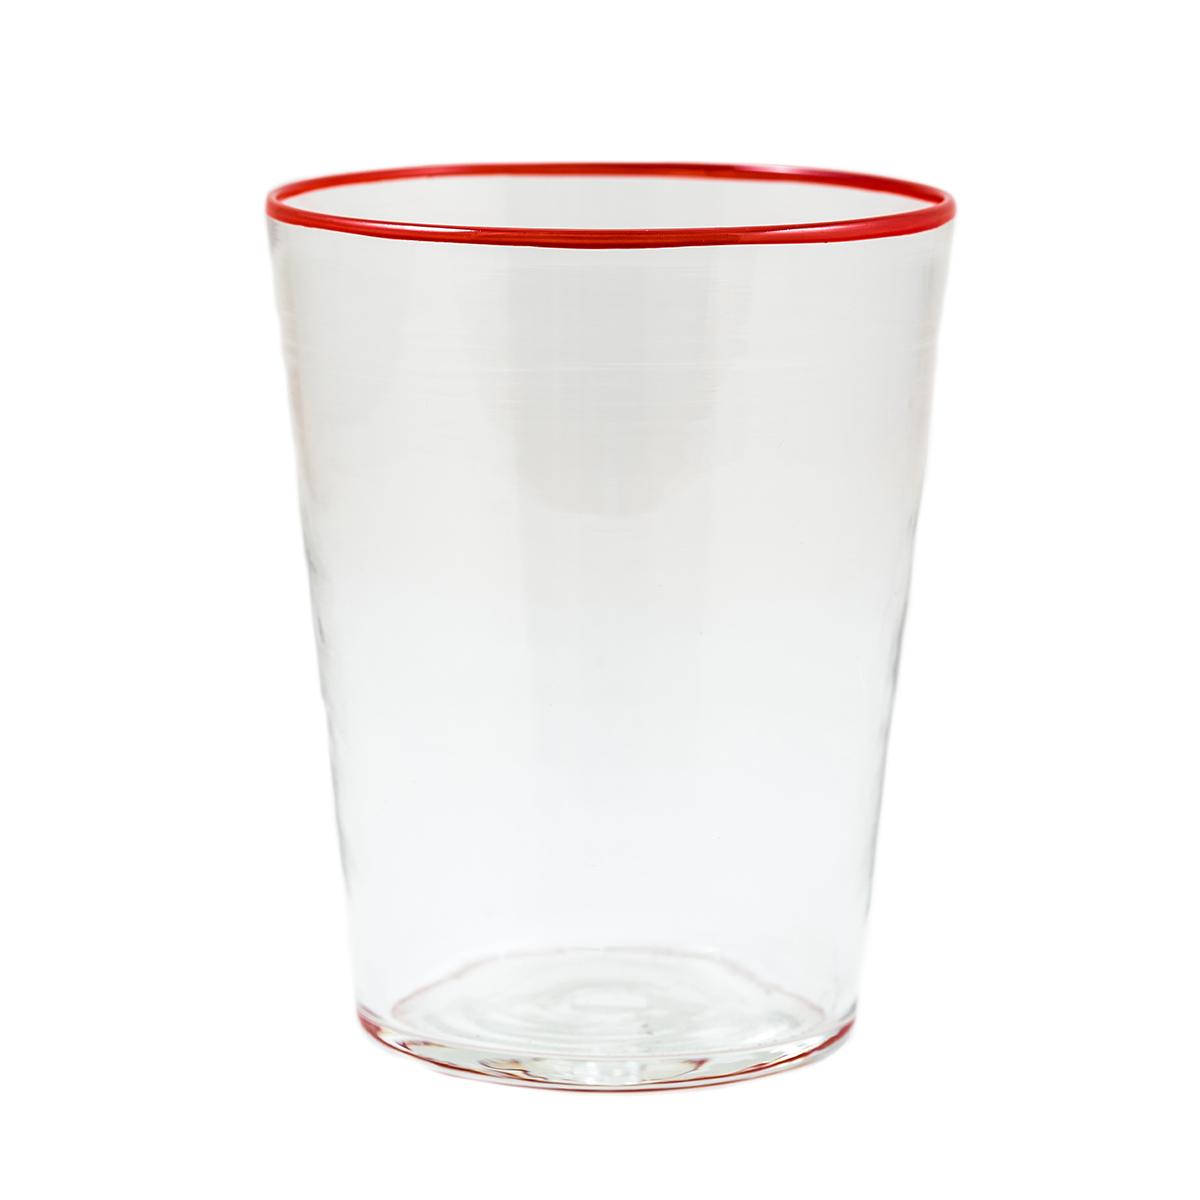 summer-vaso-glass-murano-red-rim-crystal-design-giberto-venice